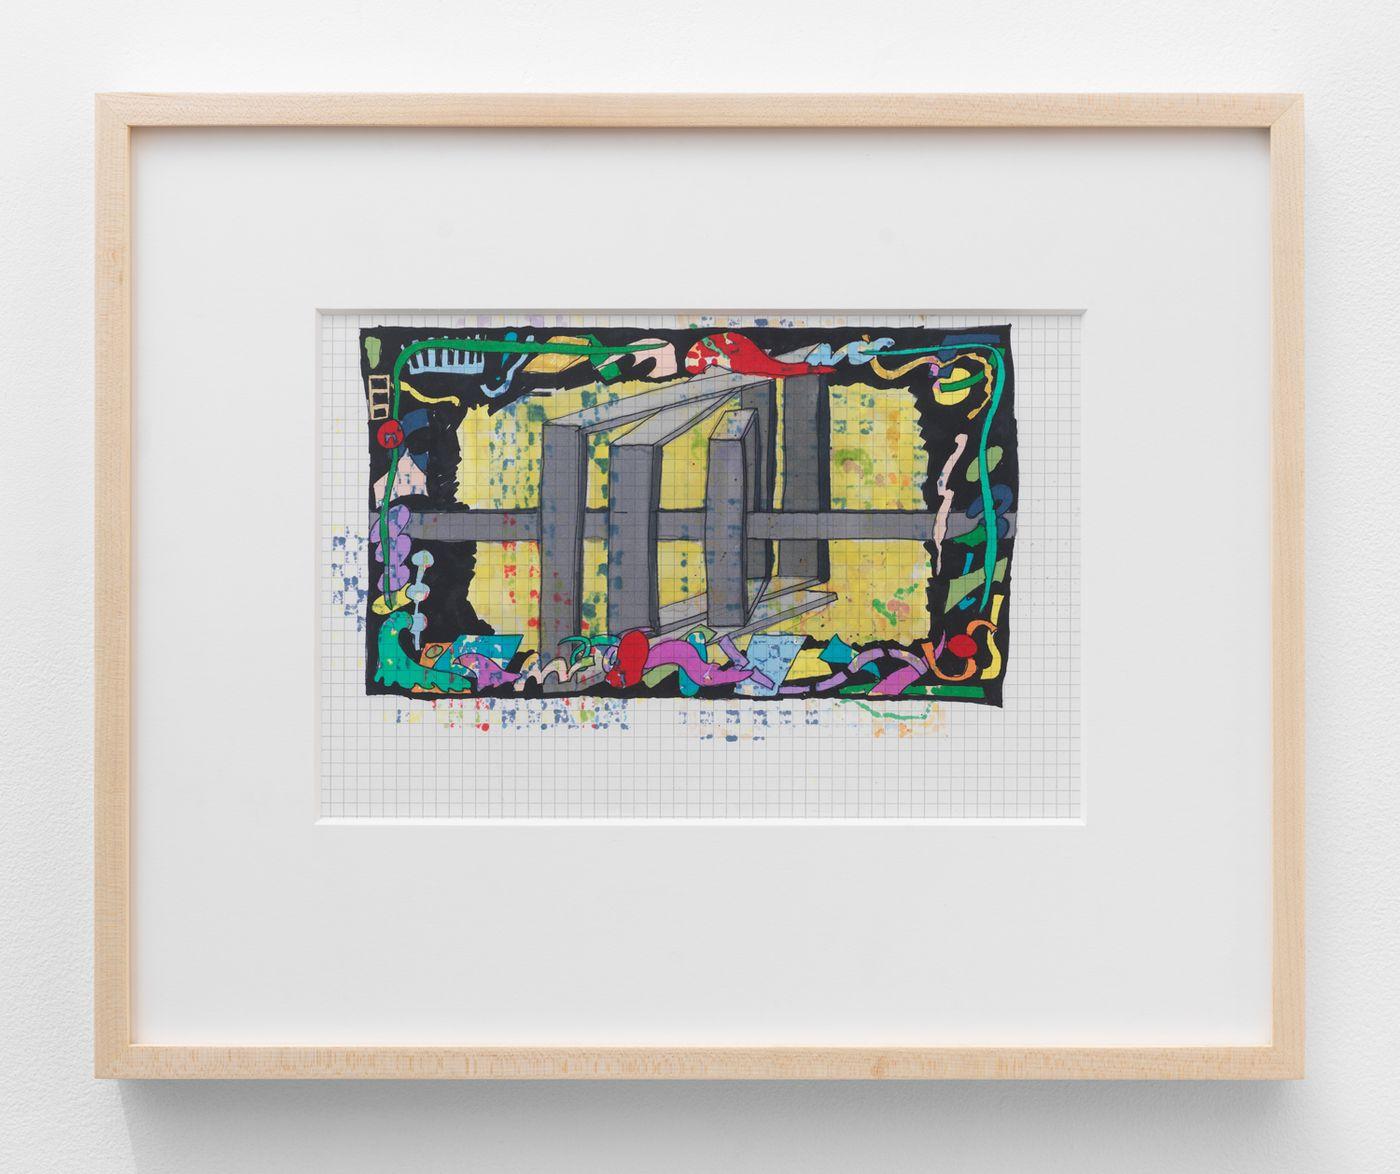 Olivia van Kuiken, Painting Plan, 2021. Ink on paper, Framed: 14.6 x 18 in (37.1 x 45.7 cm).